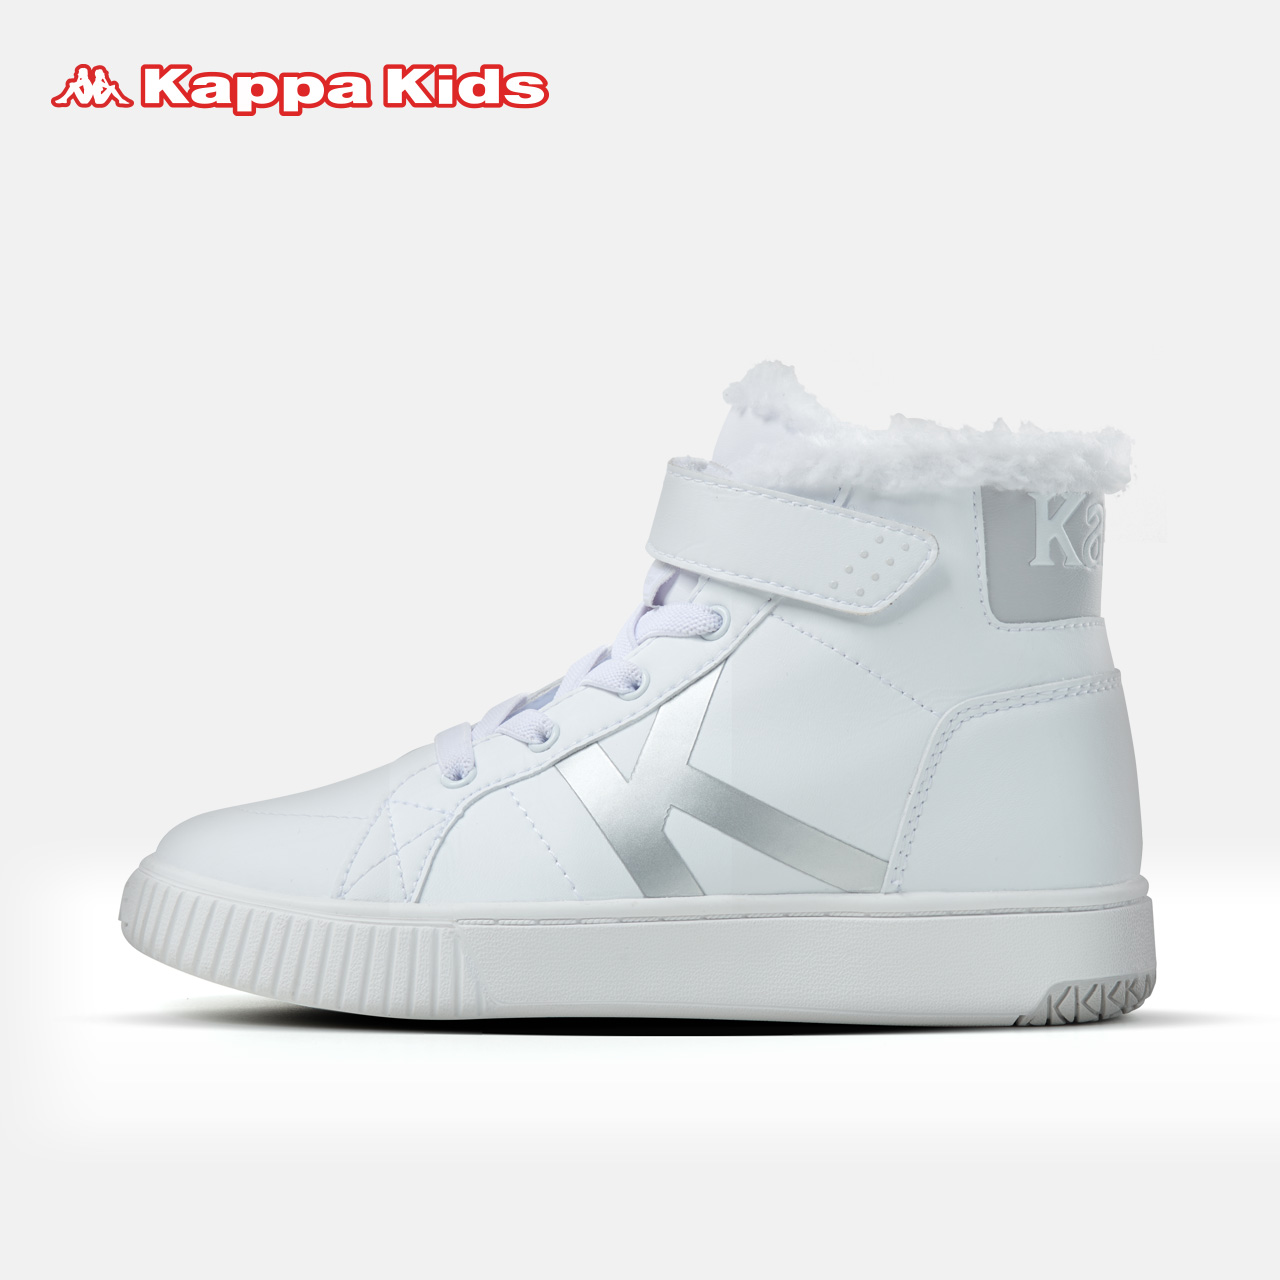 KappaKids新款童鞋男女童运动鞋时尚防滑缓震休闲板鞋儿童鞋子